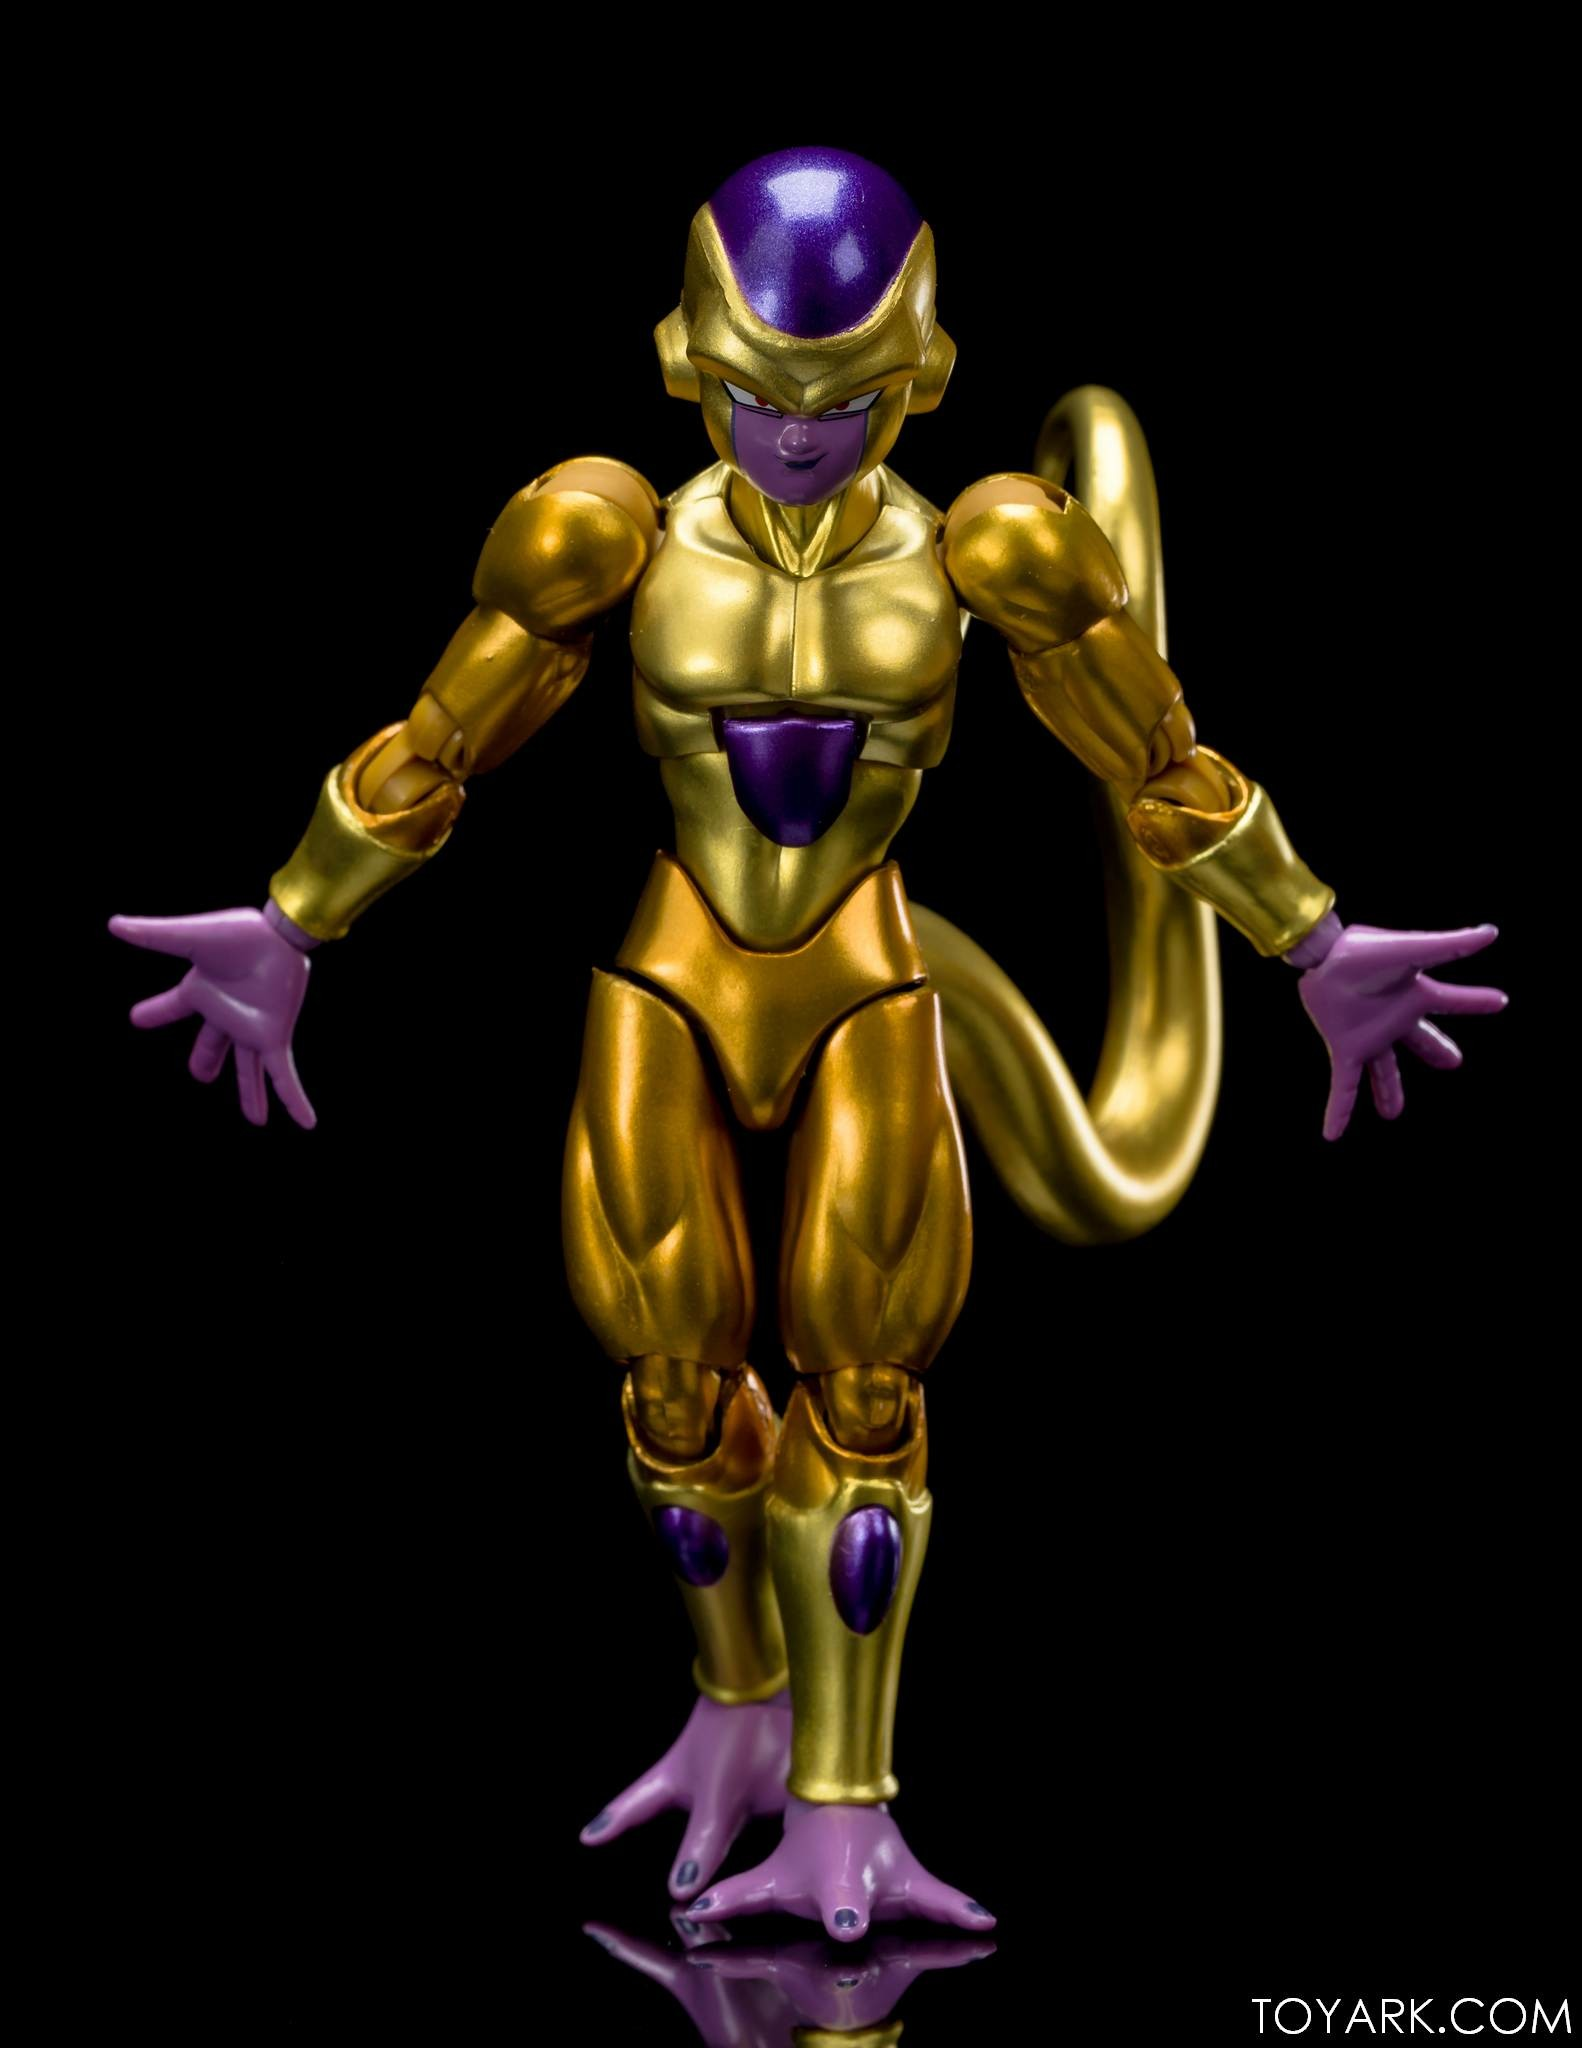 Filename: SHF-Golden-Frieza-12.jpg